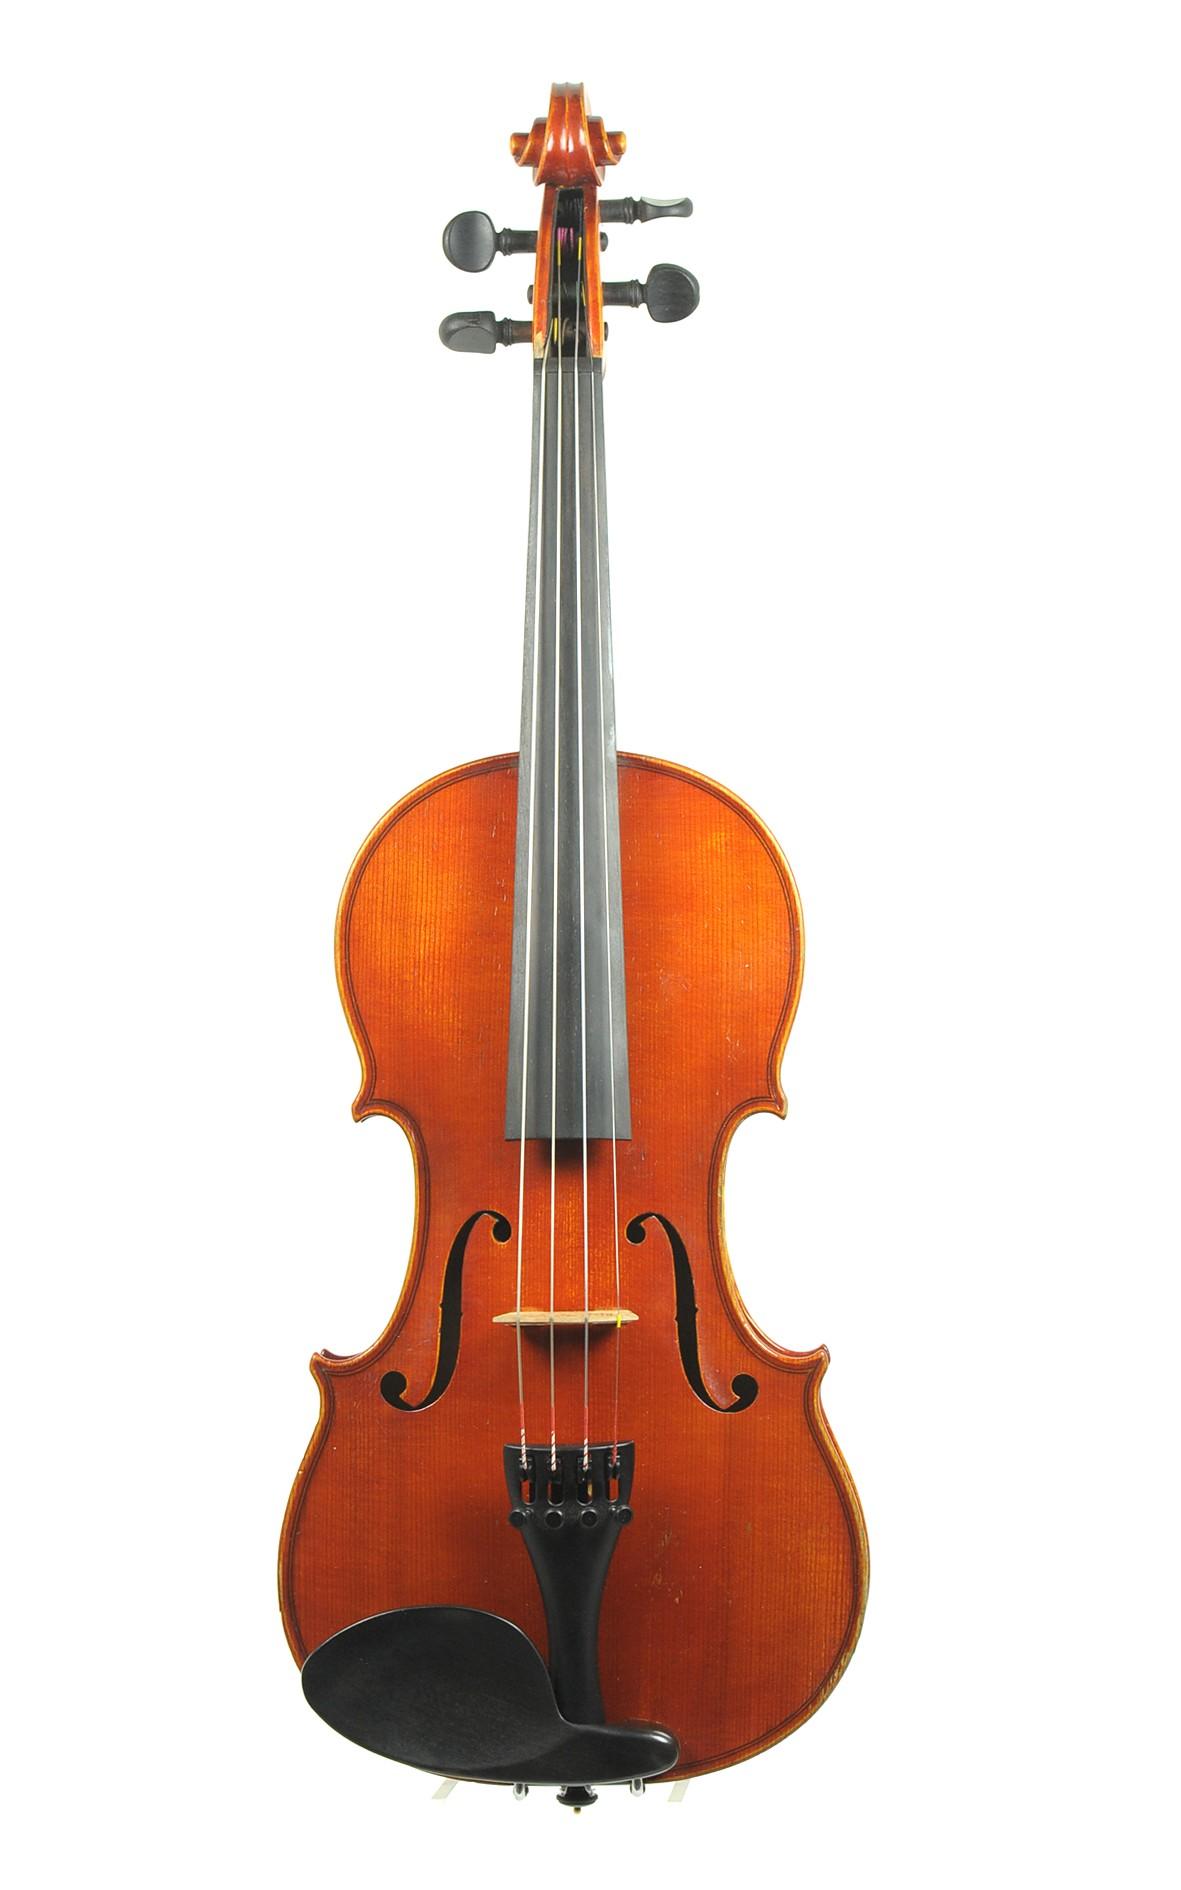 3/4 master violin, Kurt Meisel, 1922 - top